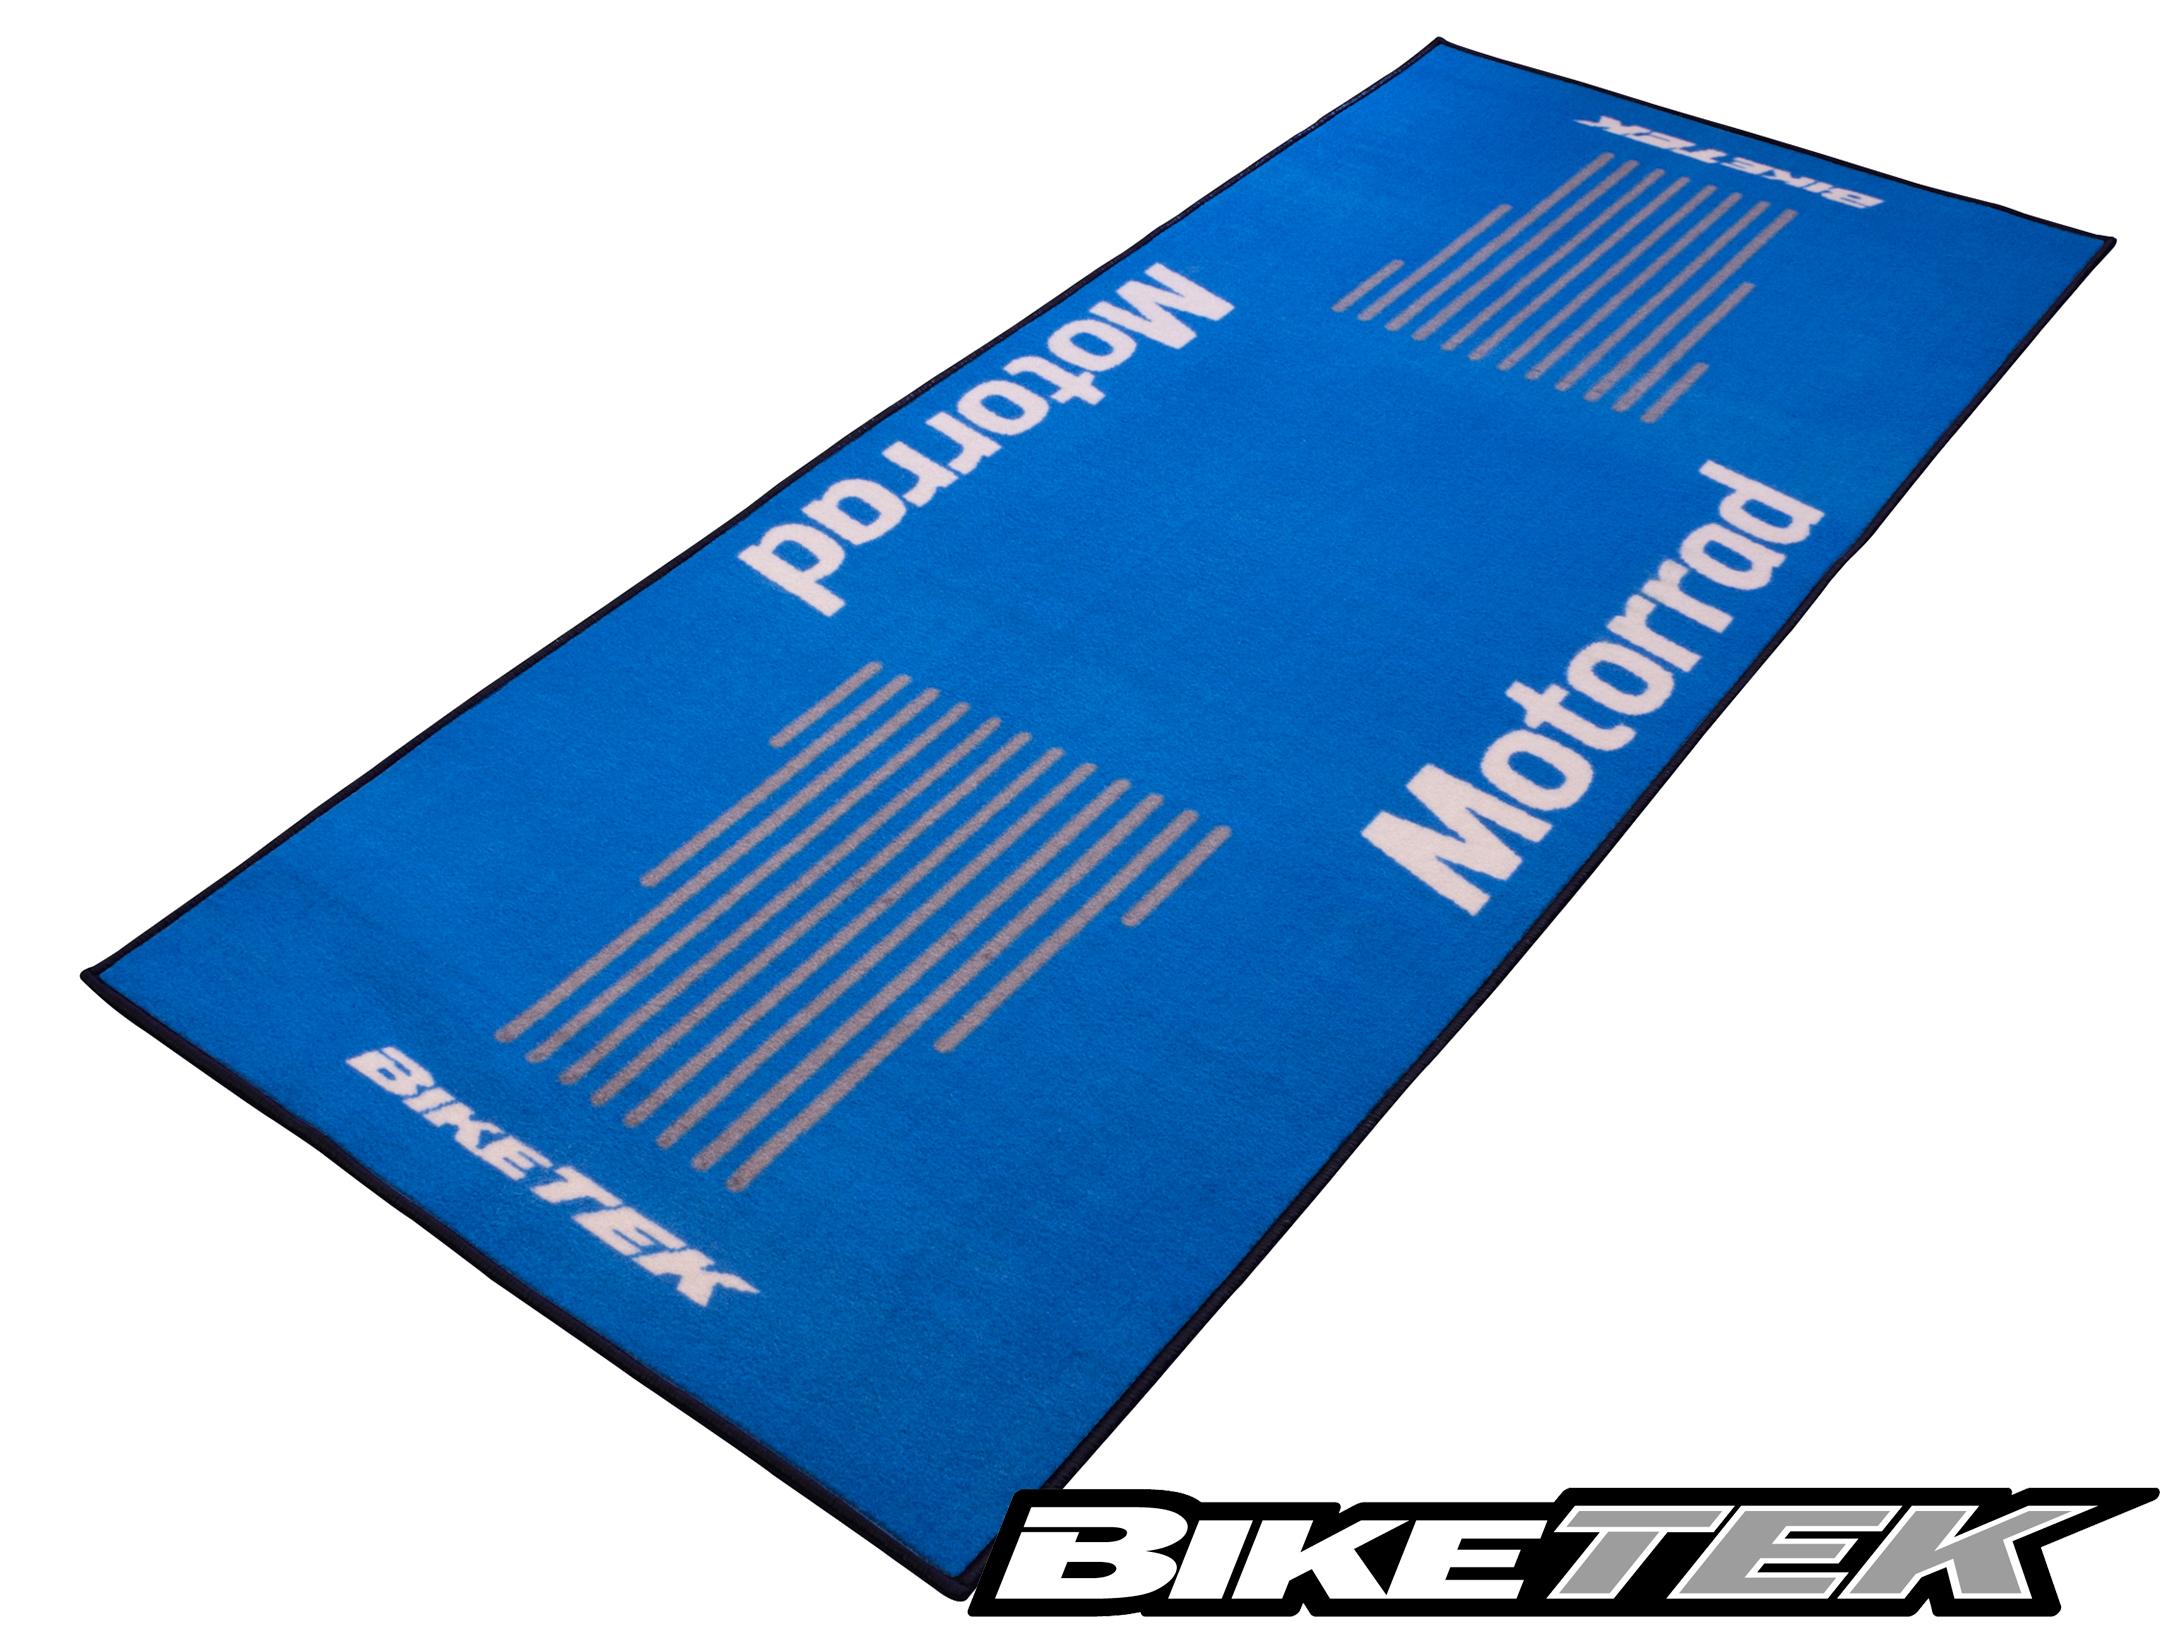 diy davidson i mats designs floor decor home harley garage furniture motorcycle mat